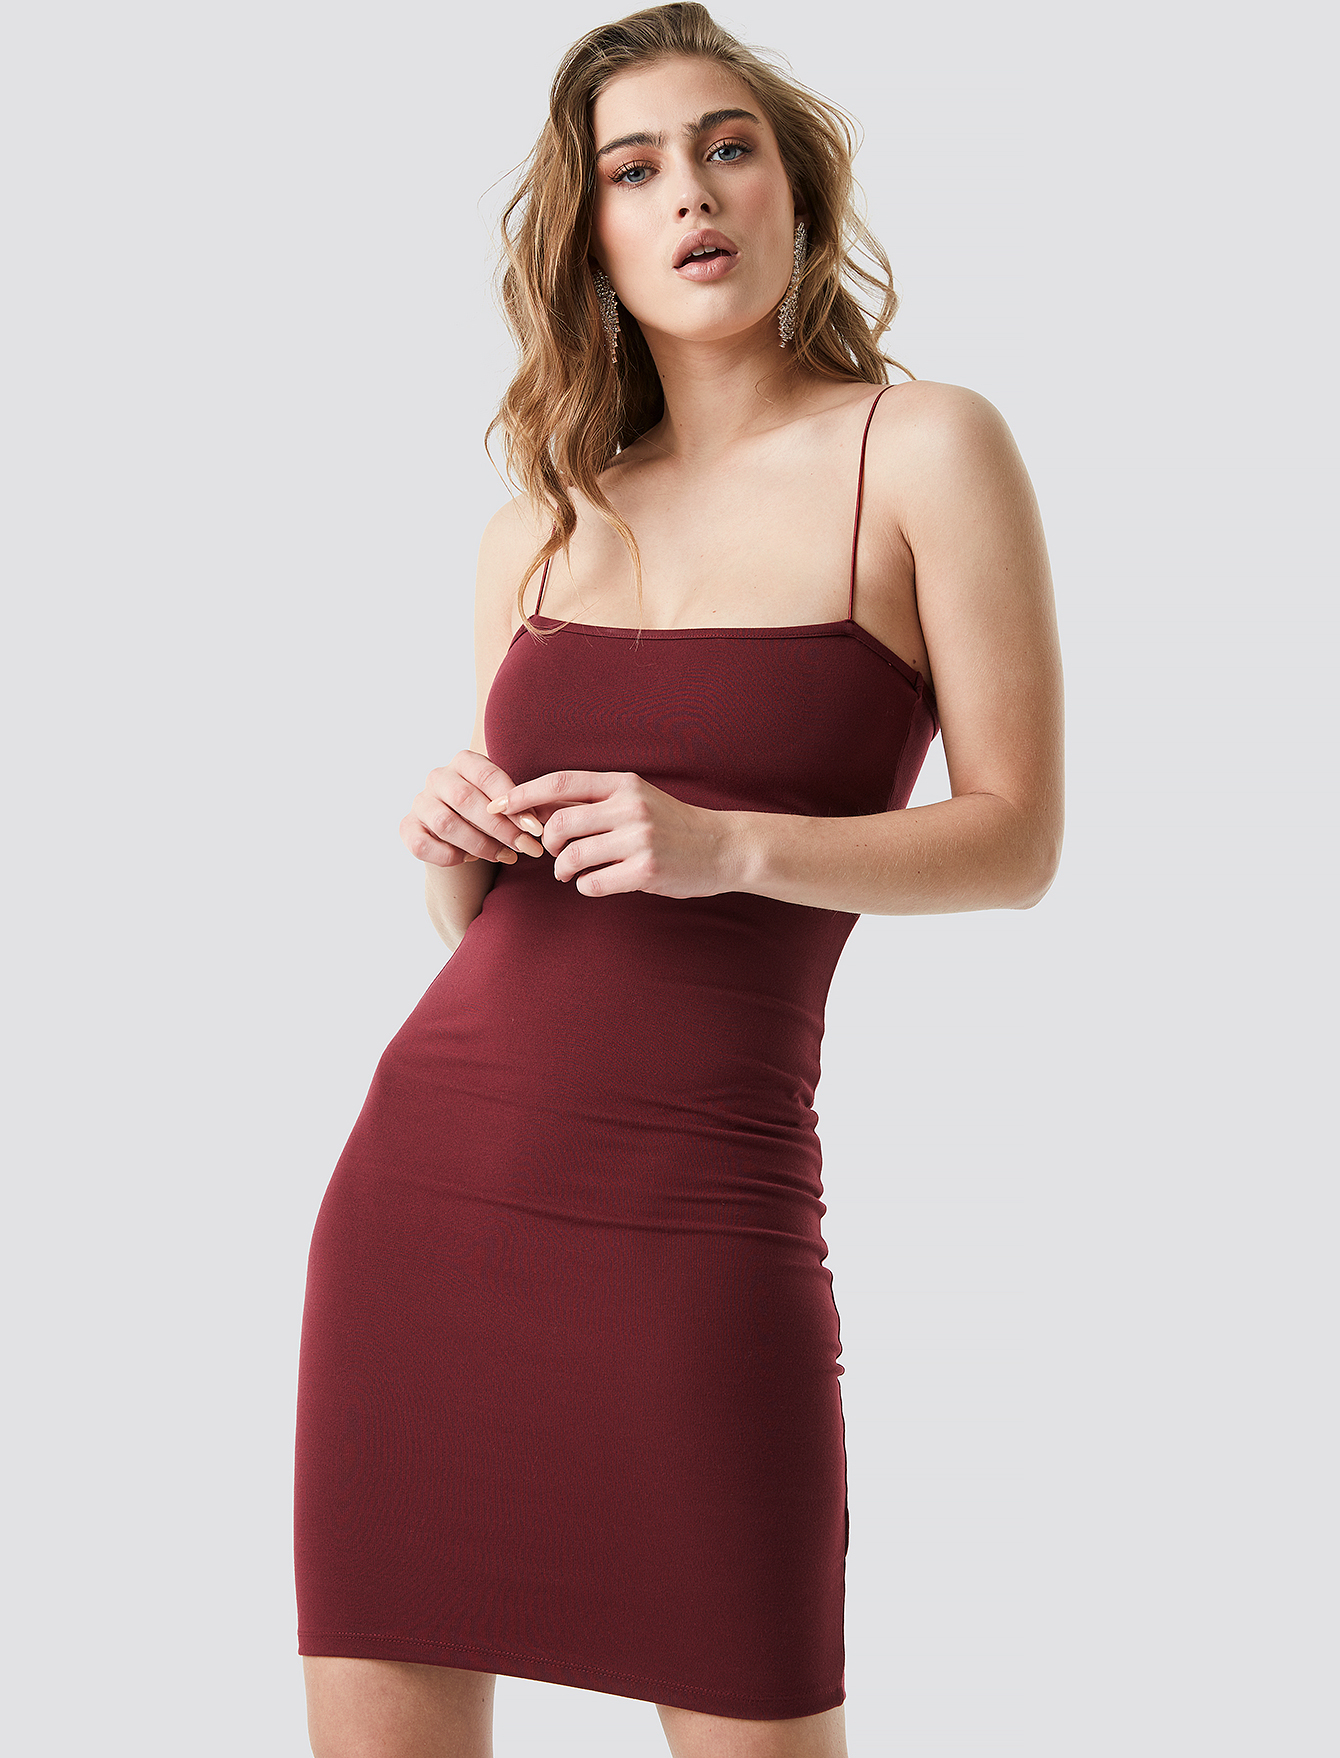 Spaghetti Strap Dress NA-KD.COM